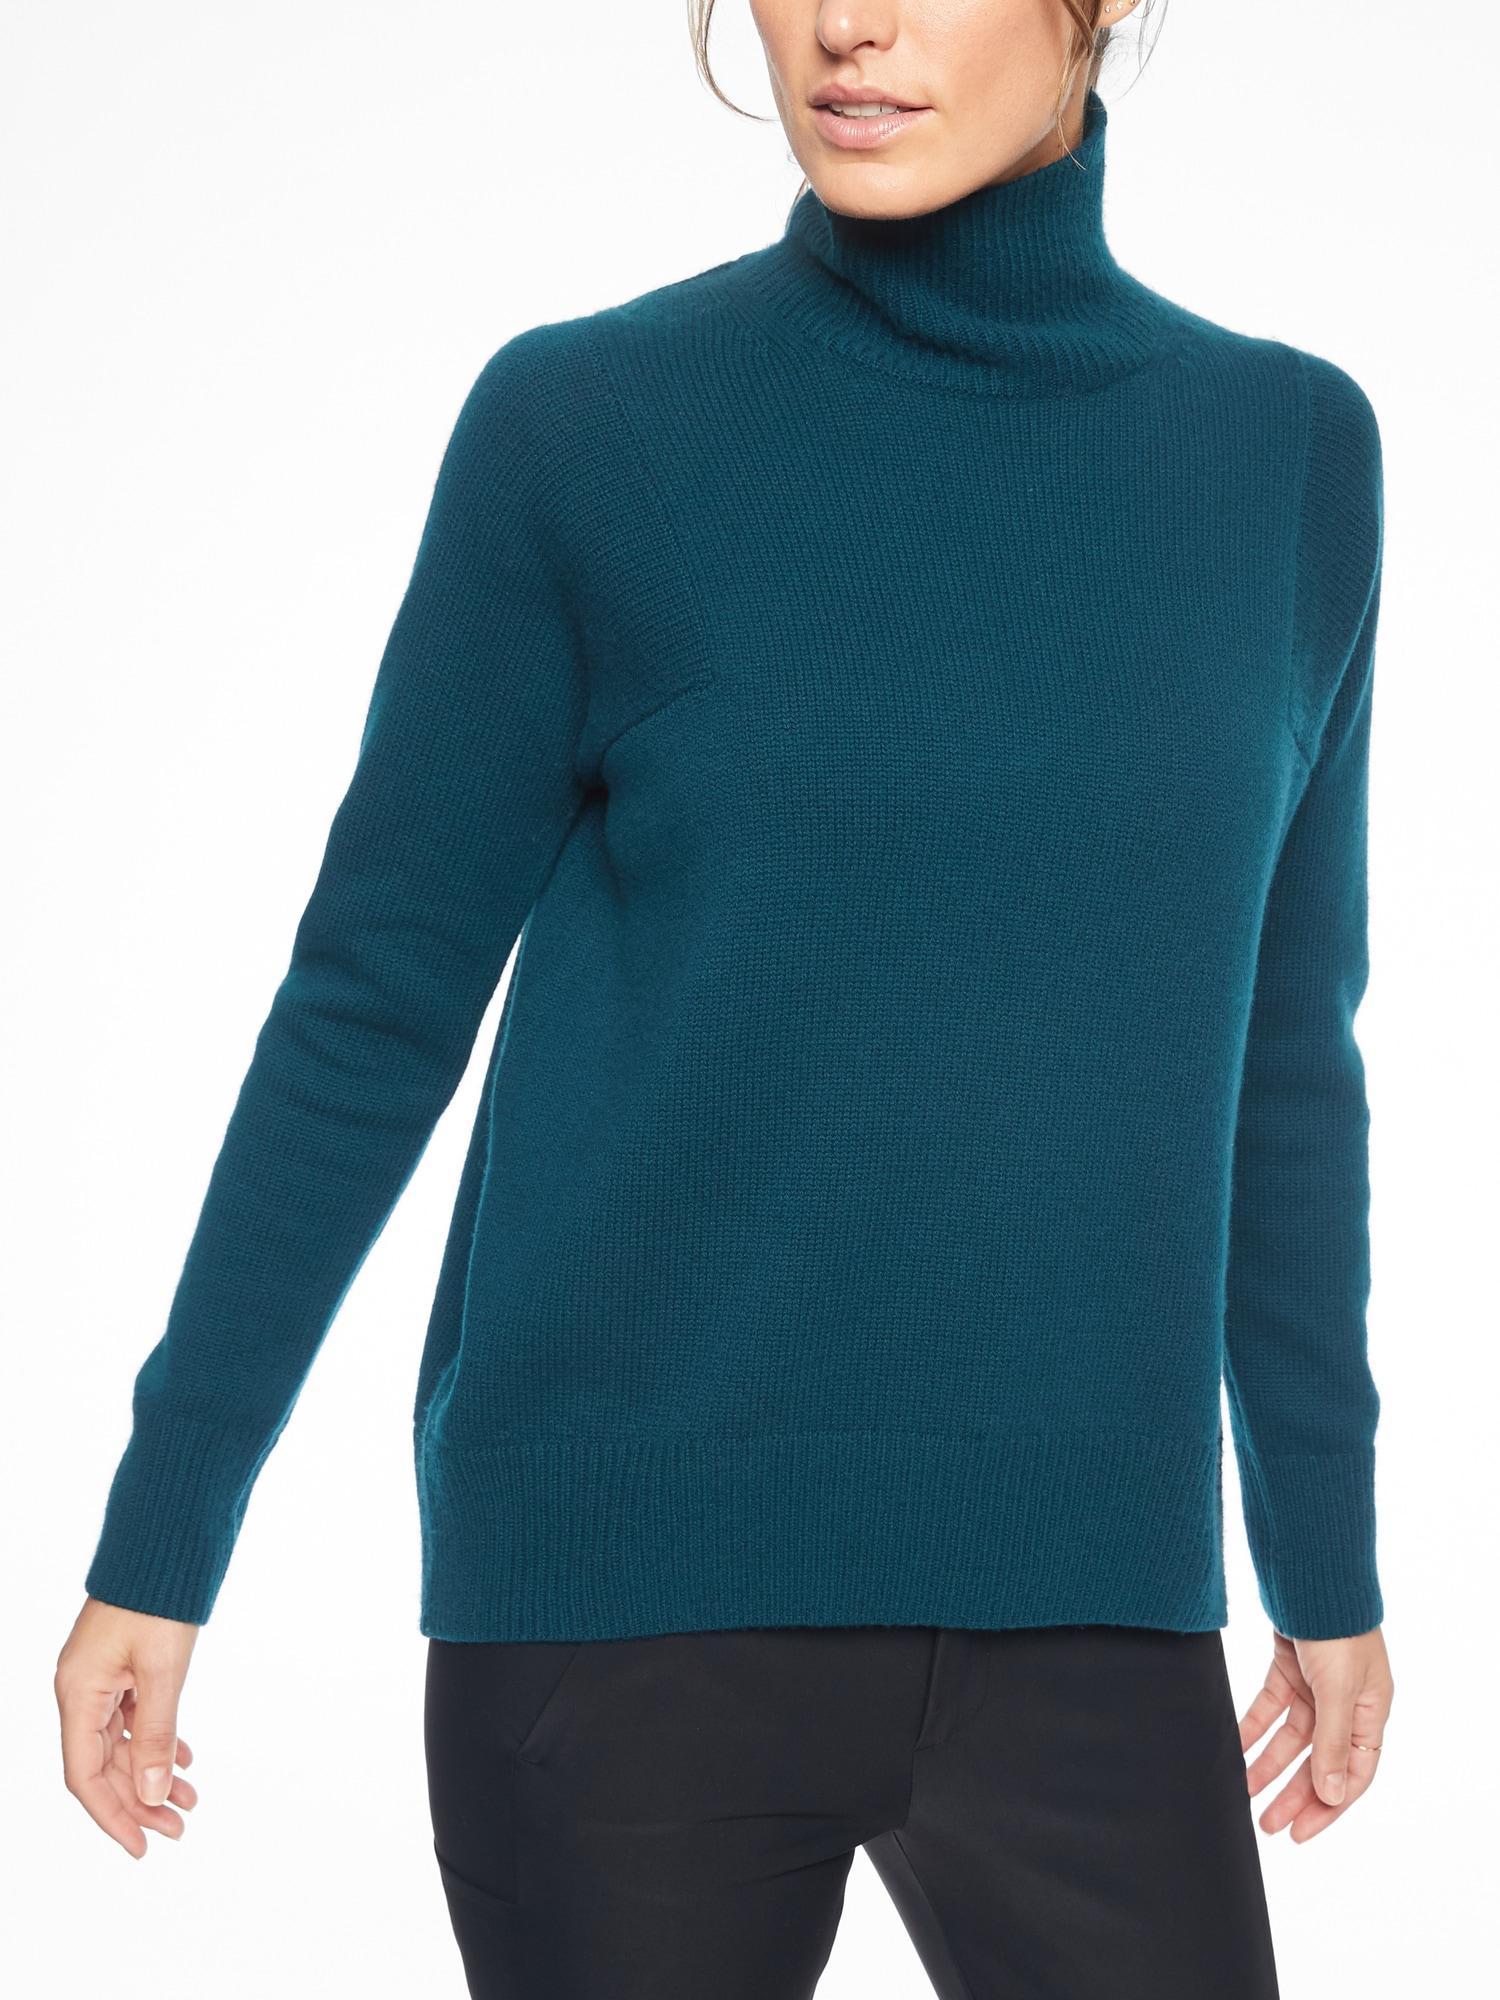 734c2919503 Lyst - Athleta Bedford Wool Cashmere Turtleneck Sweater in Blue